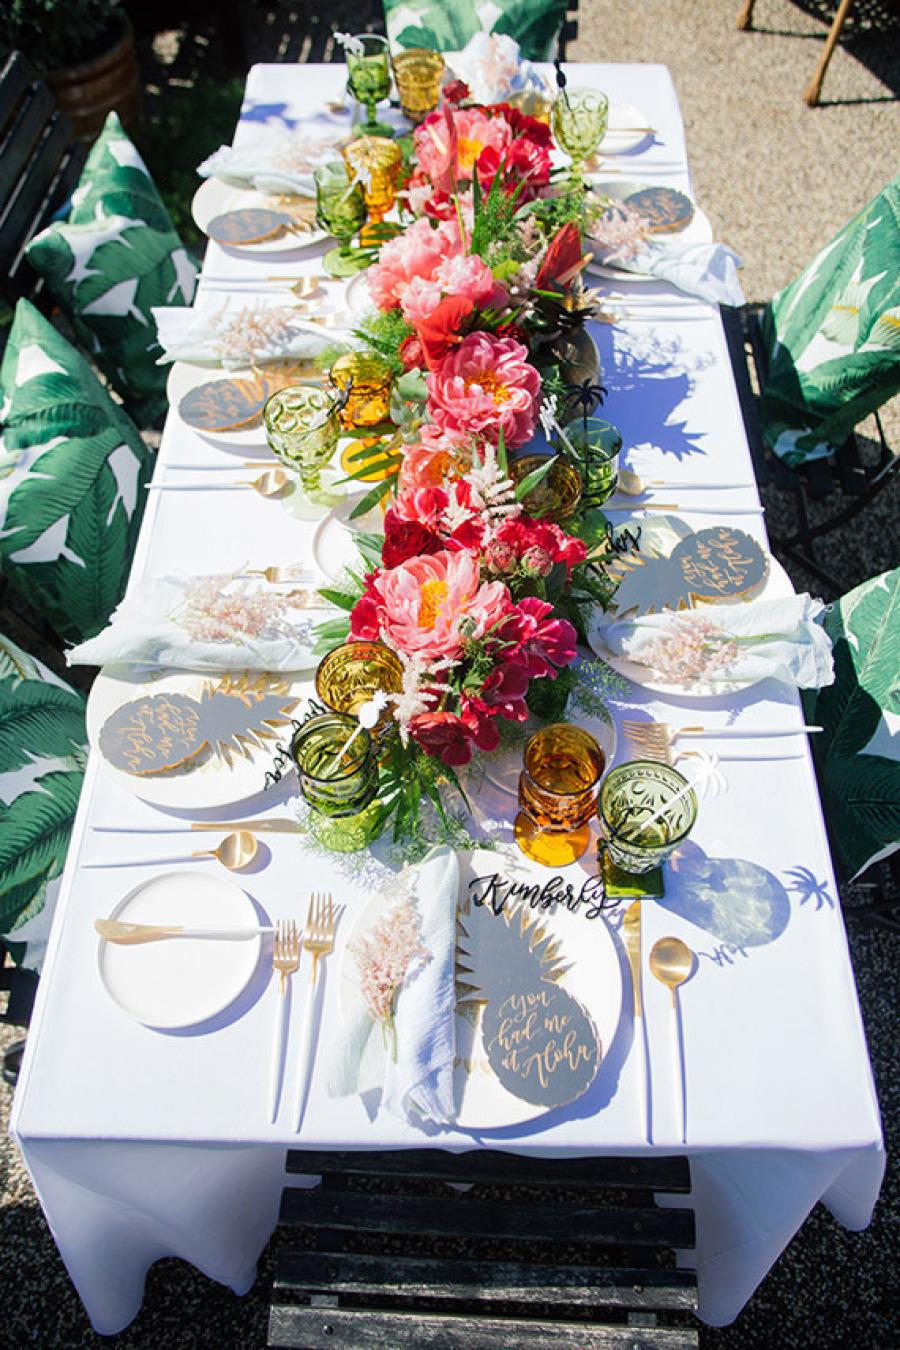 37 Table Decoration Ideas For A Summer Garden Party ... on Backyard Table Decor id=91660